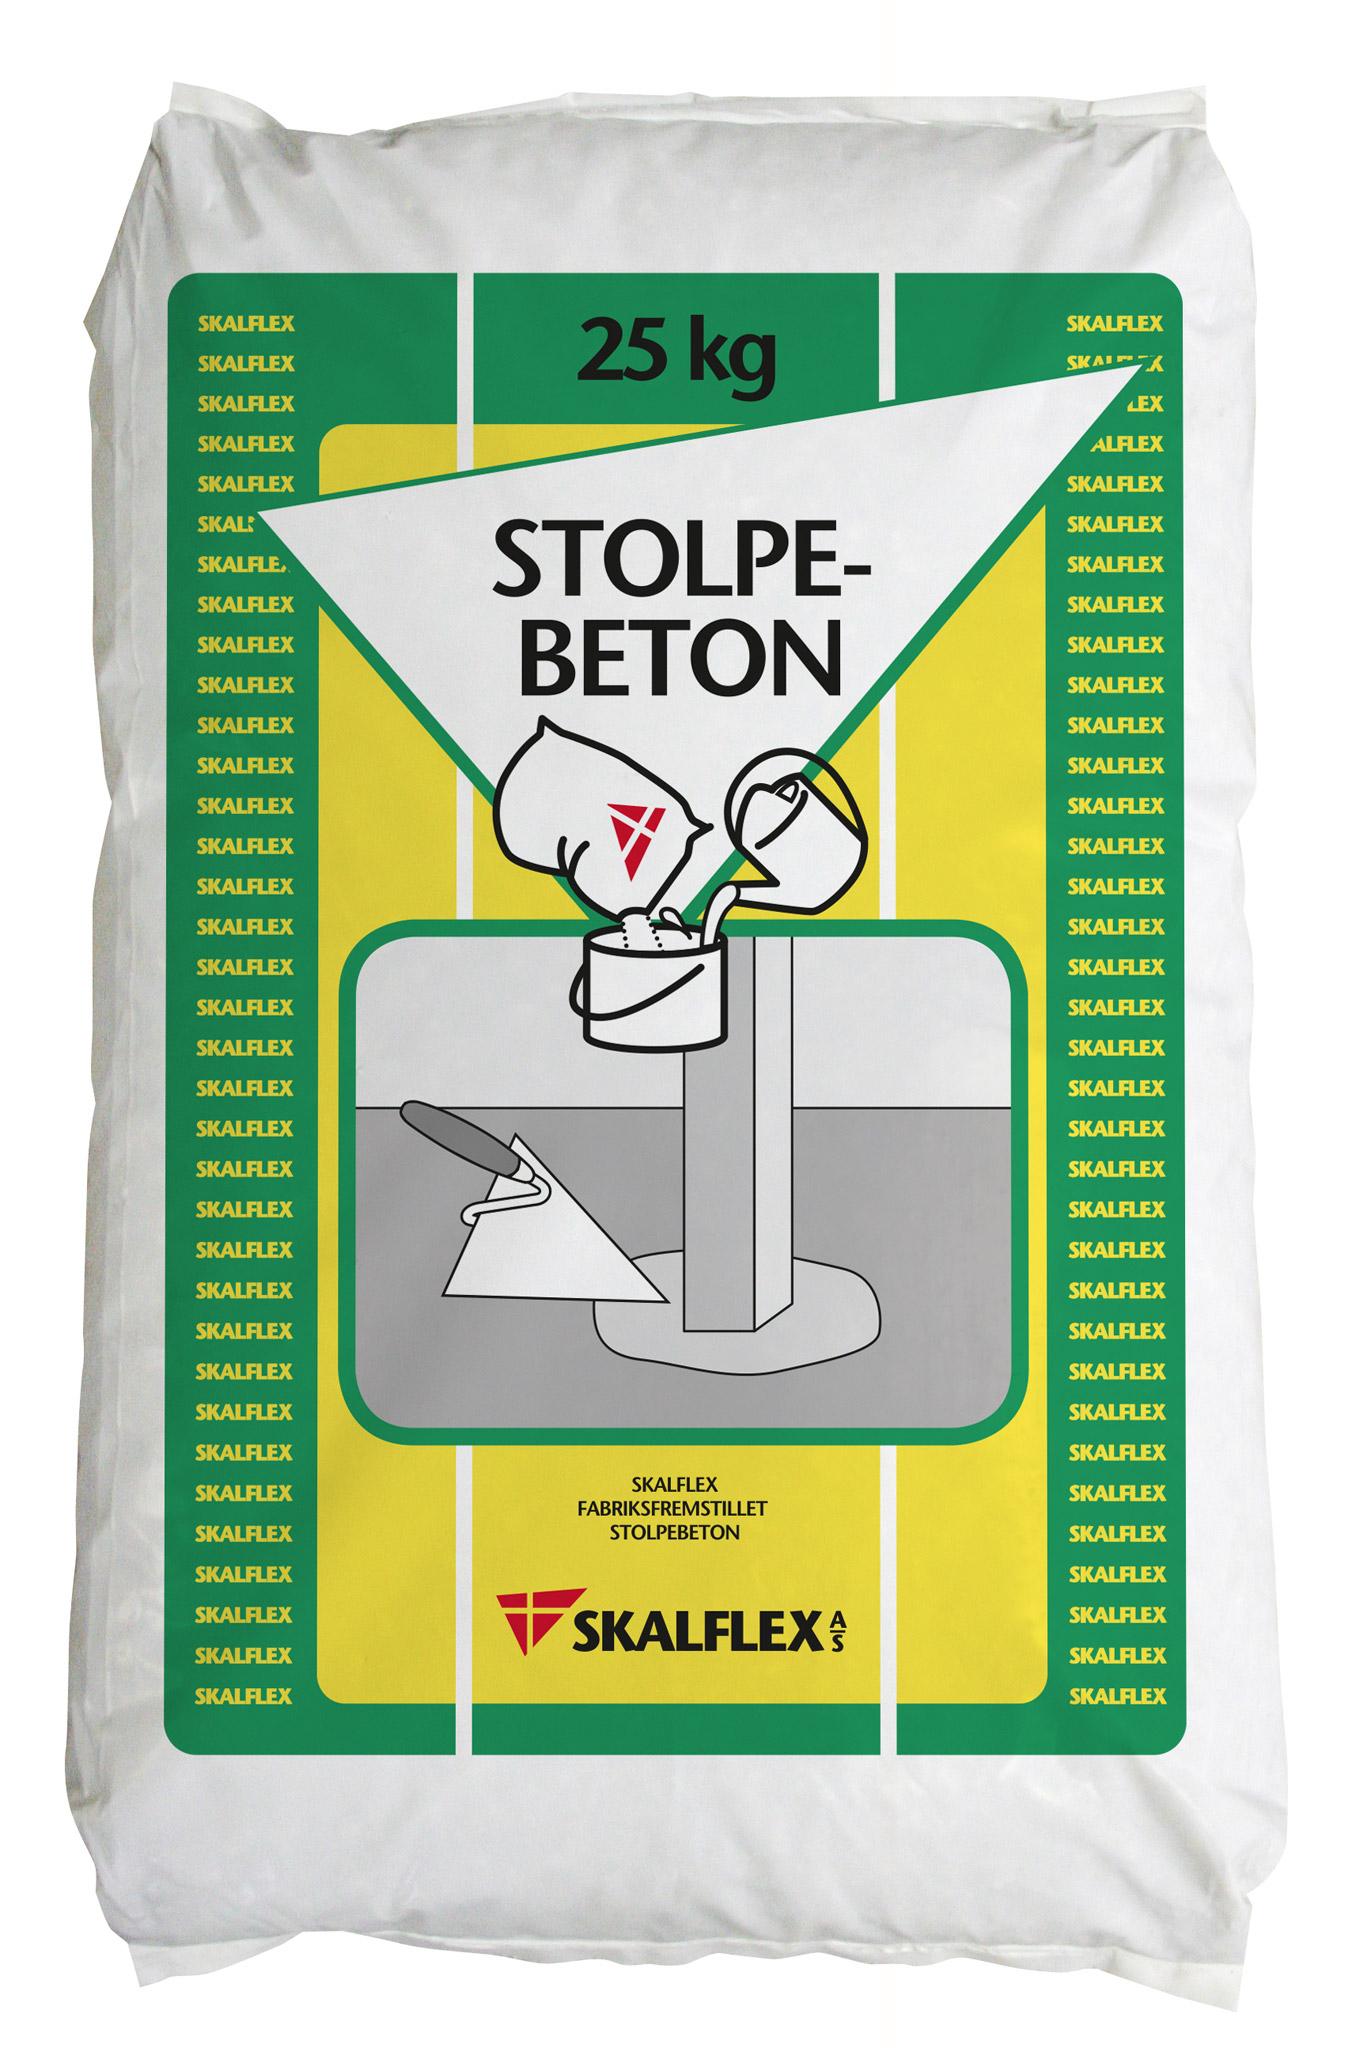 Skalflex stolpebeton